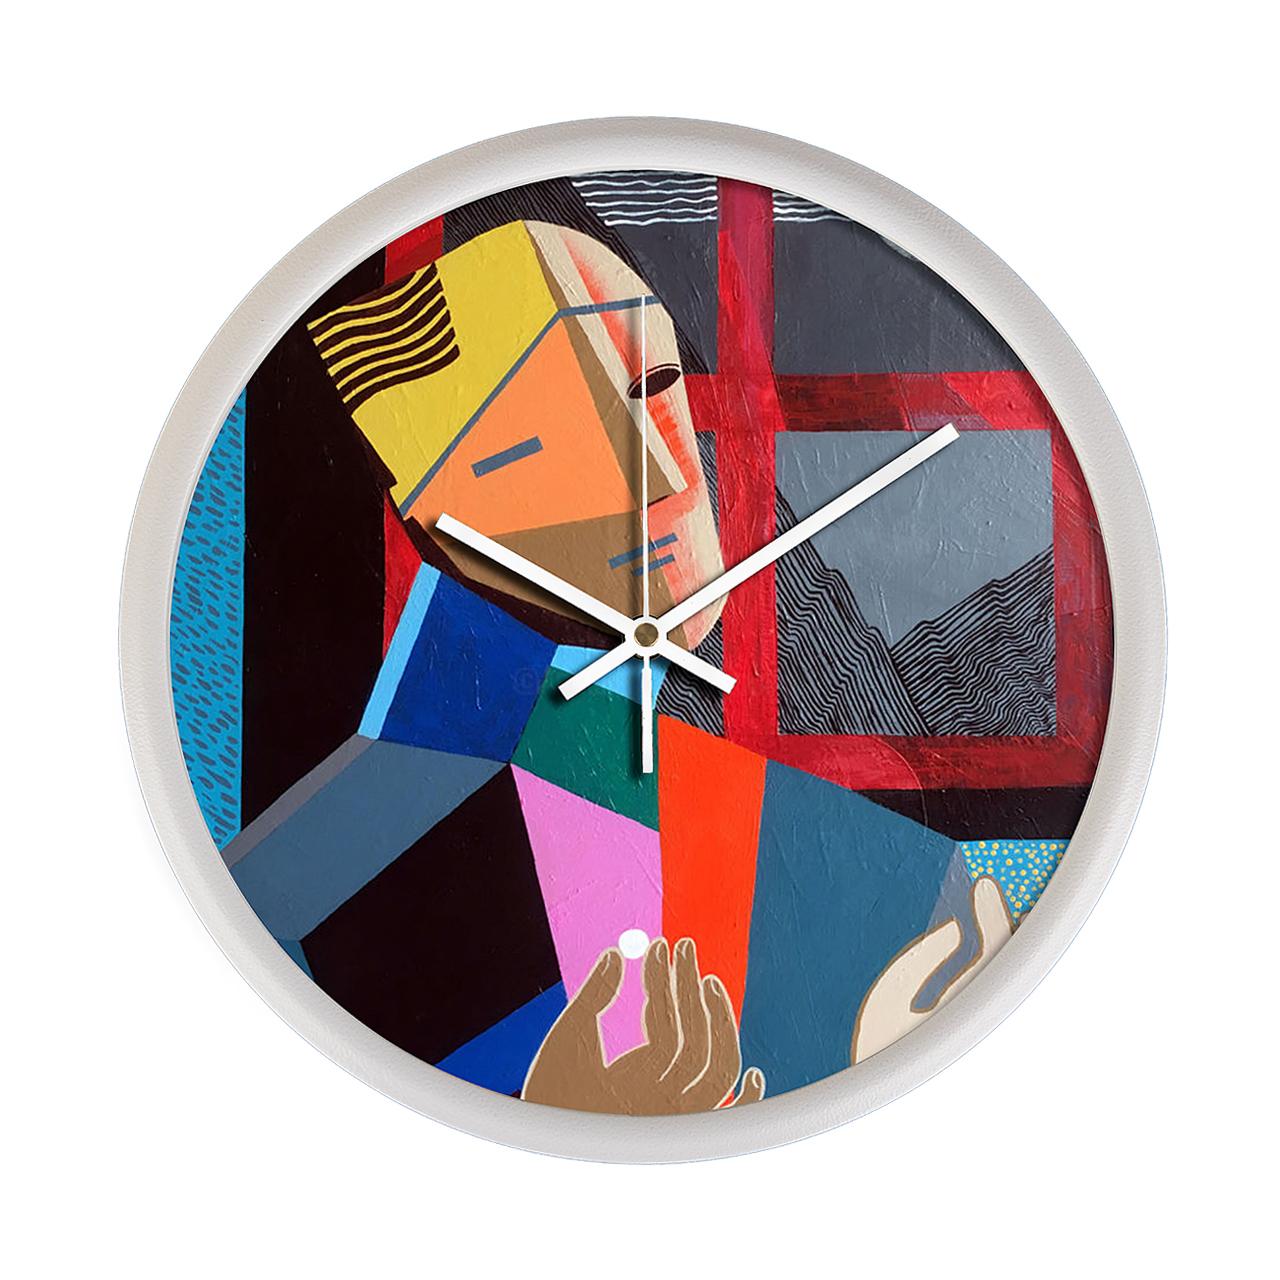 ساعت دیواری مینی مال لاکچری مدل 35Dio3_0503